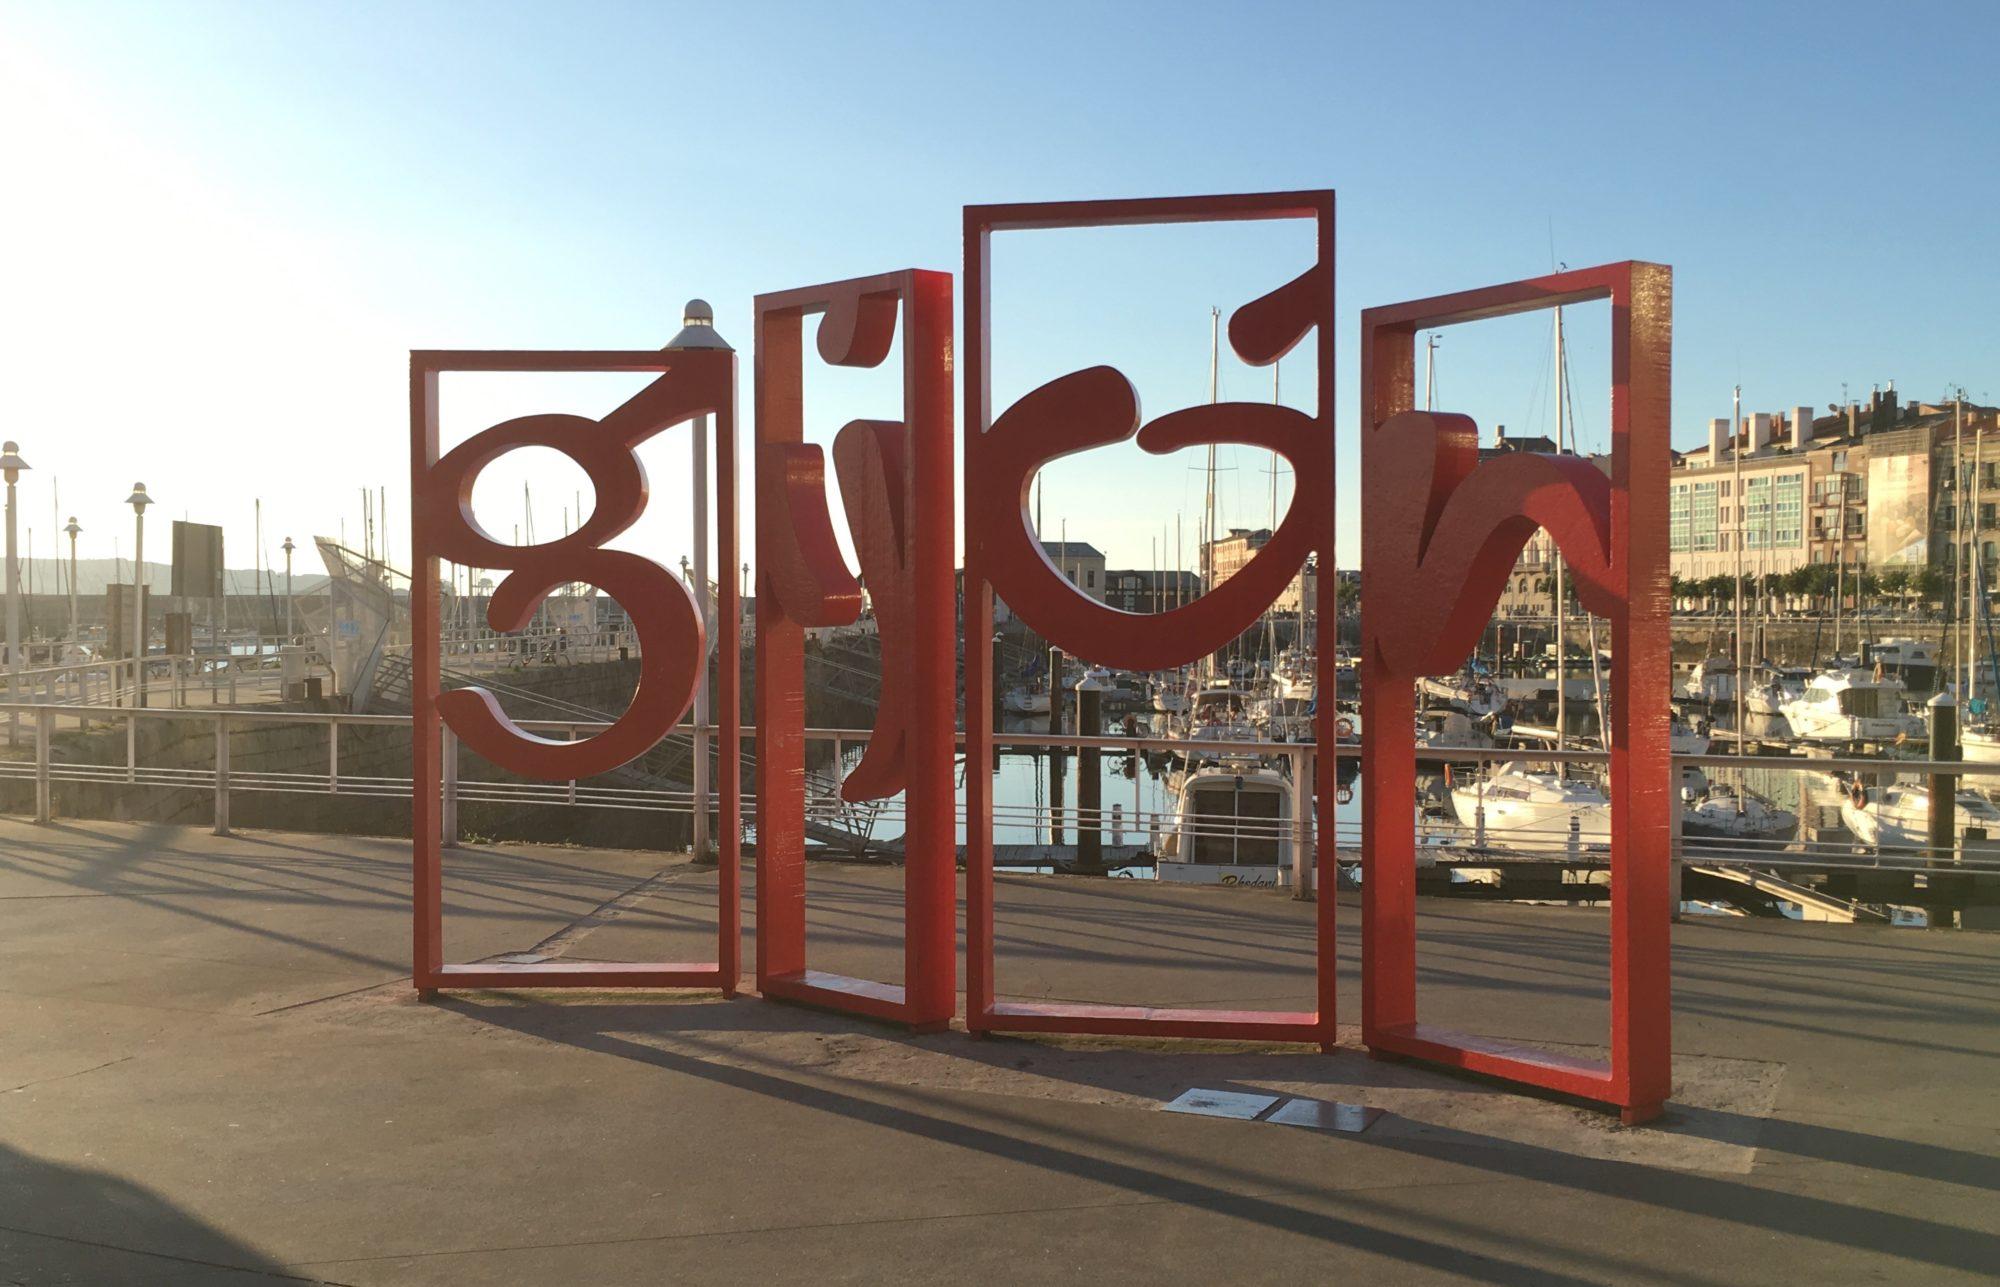 Gijón travel guide